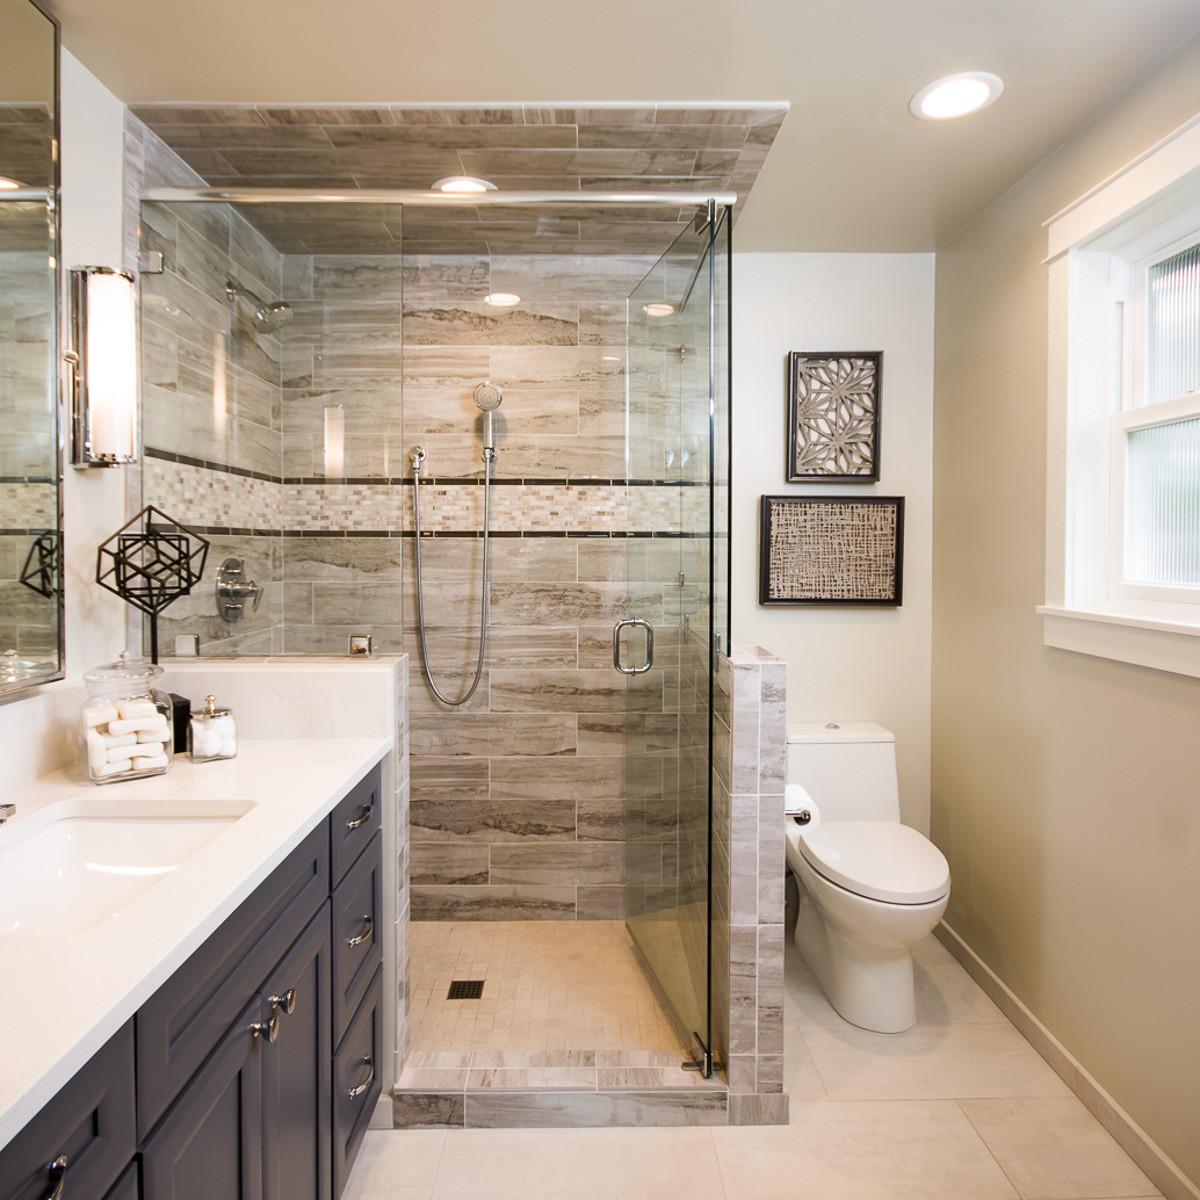 Small Spa Bathroom  Luxurious and Spacious Master Bathroom on a small